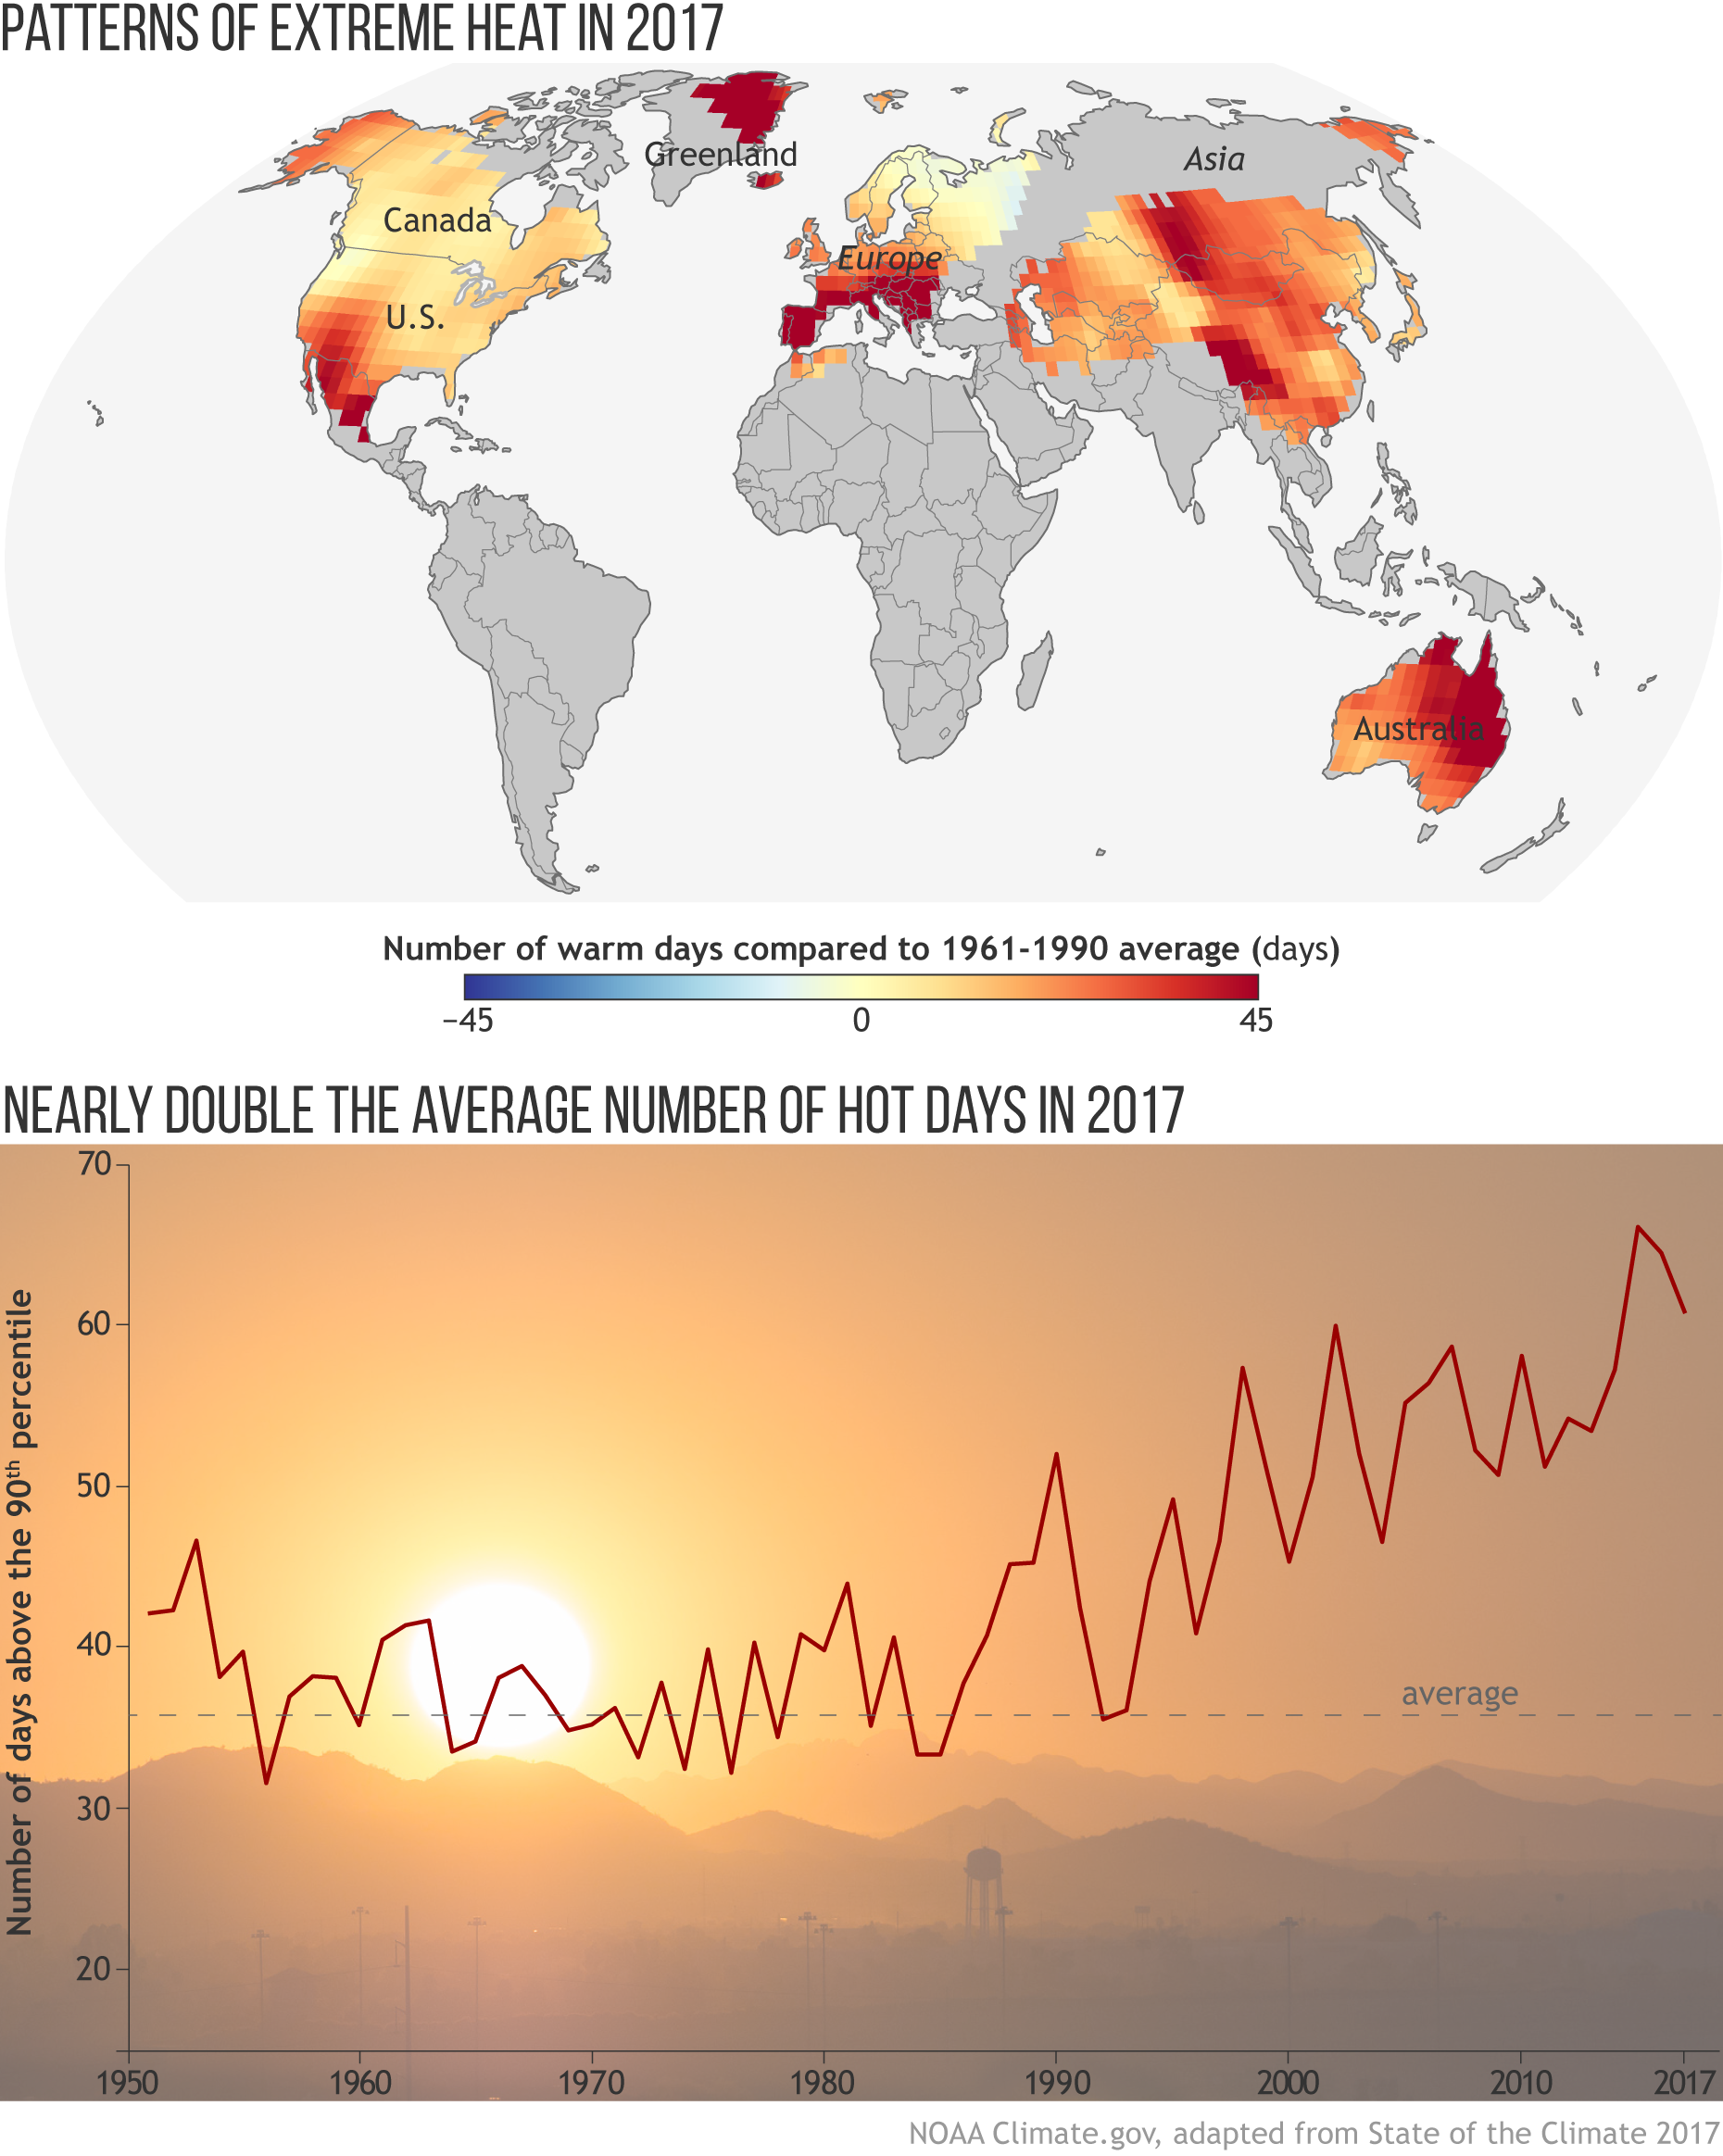 https://www.climate.gov/sites/default/files/SotC2017_08_VeryWarmDays_combo_large.png